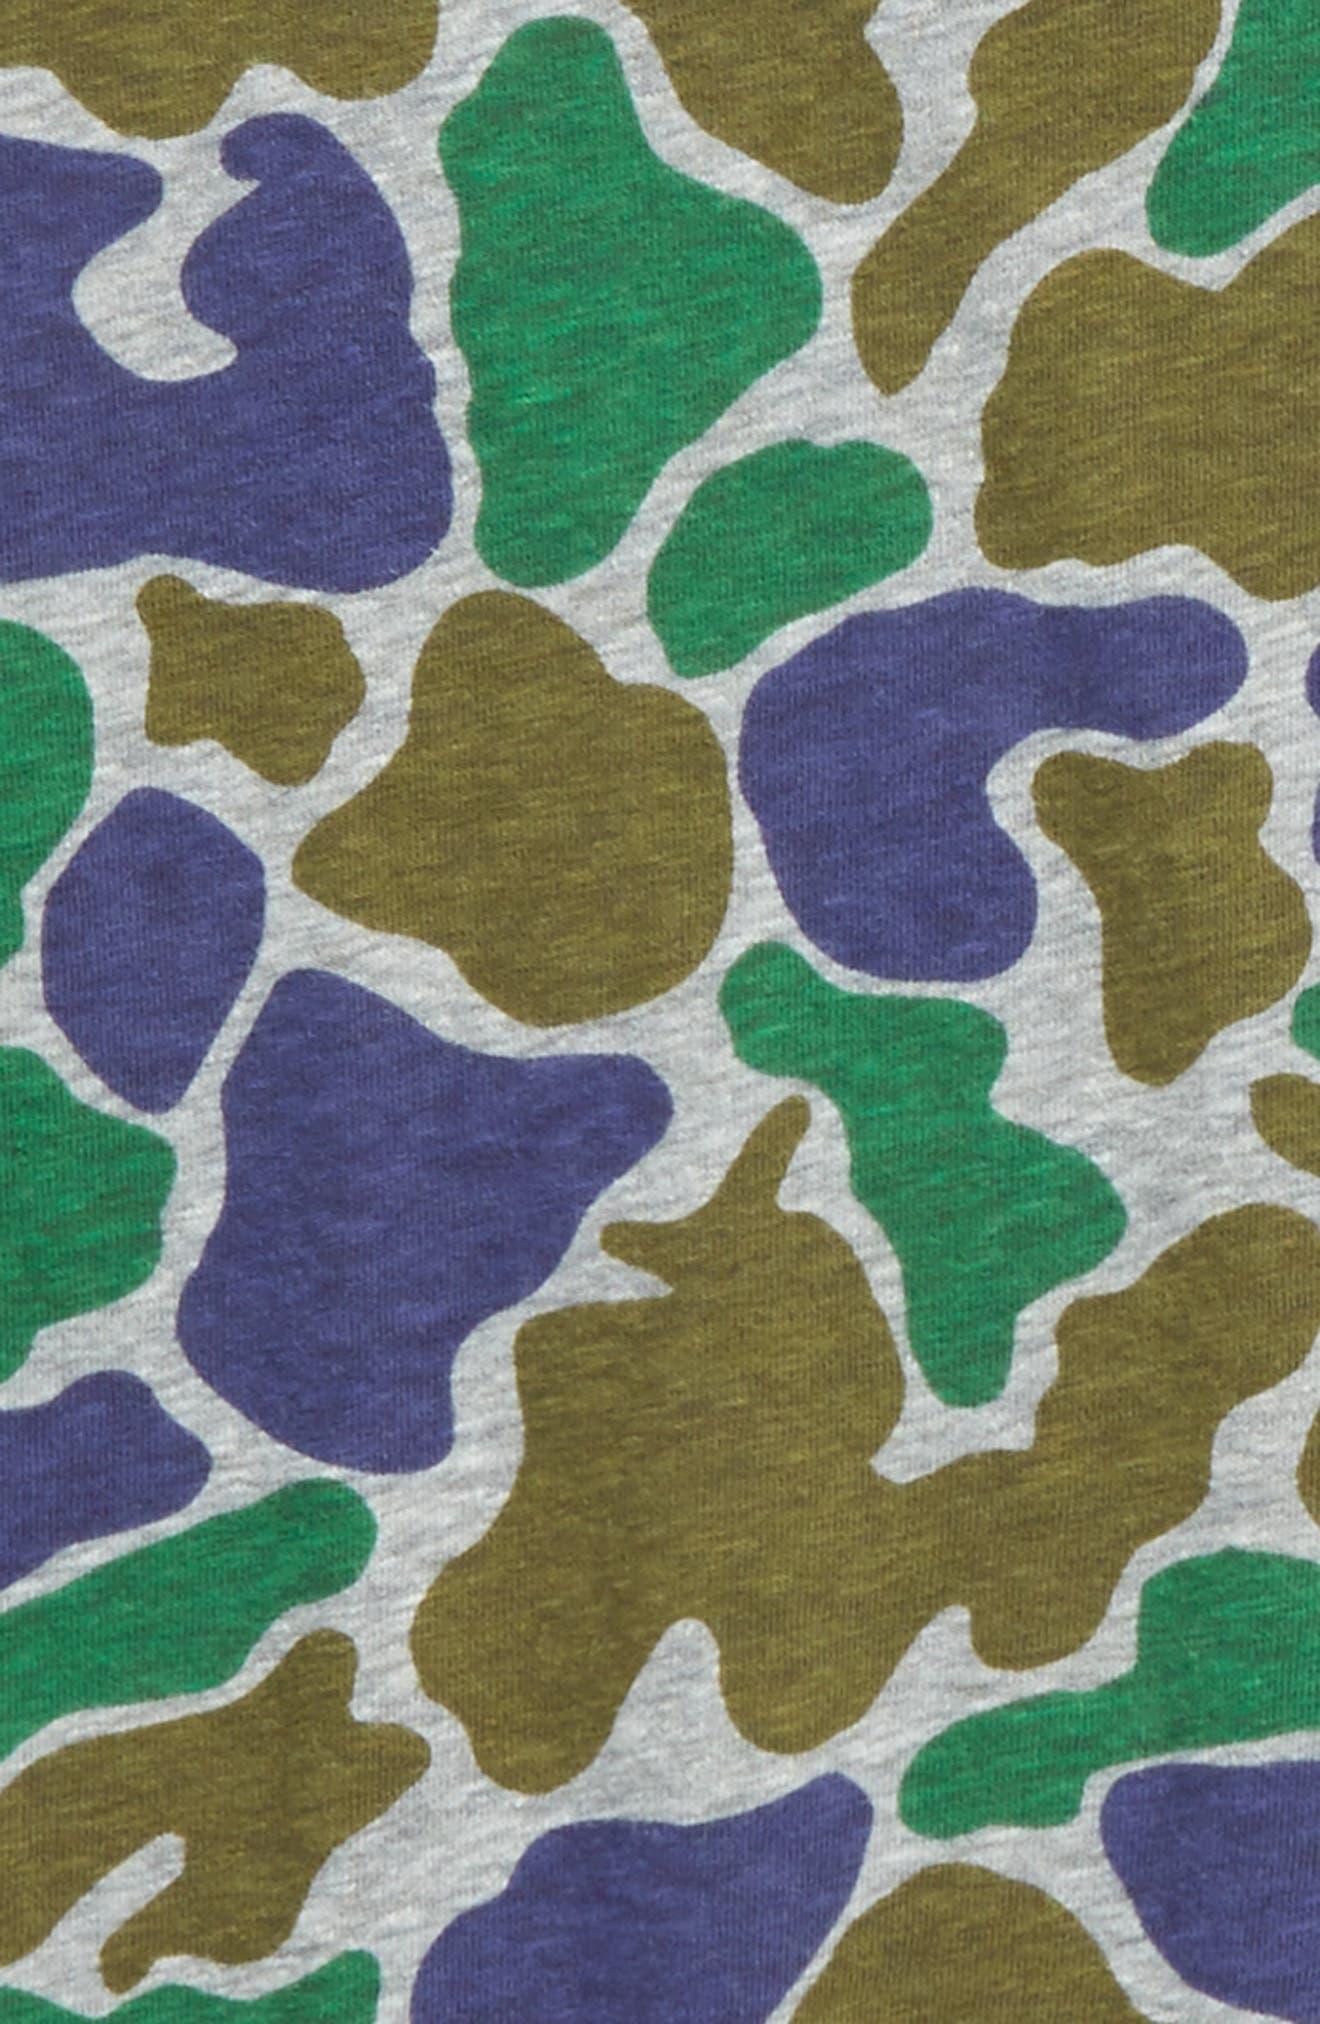 CREWCUTS BY J.CREW,                             Camo T-Shirt,                             Alternate thumbnail 2, color,                             020